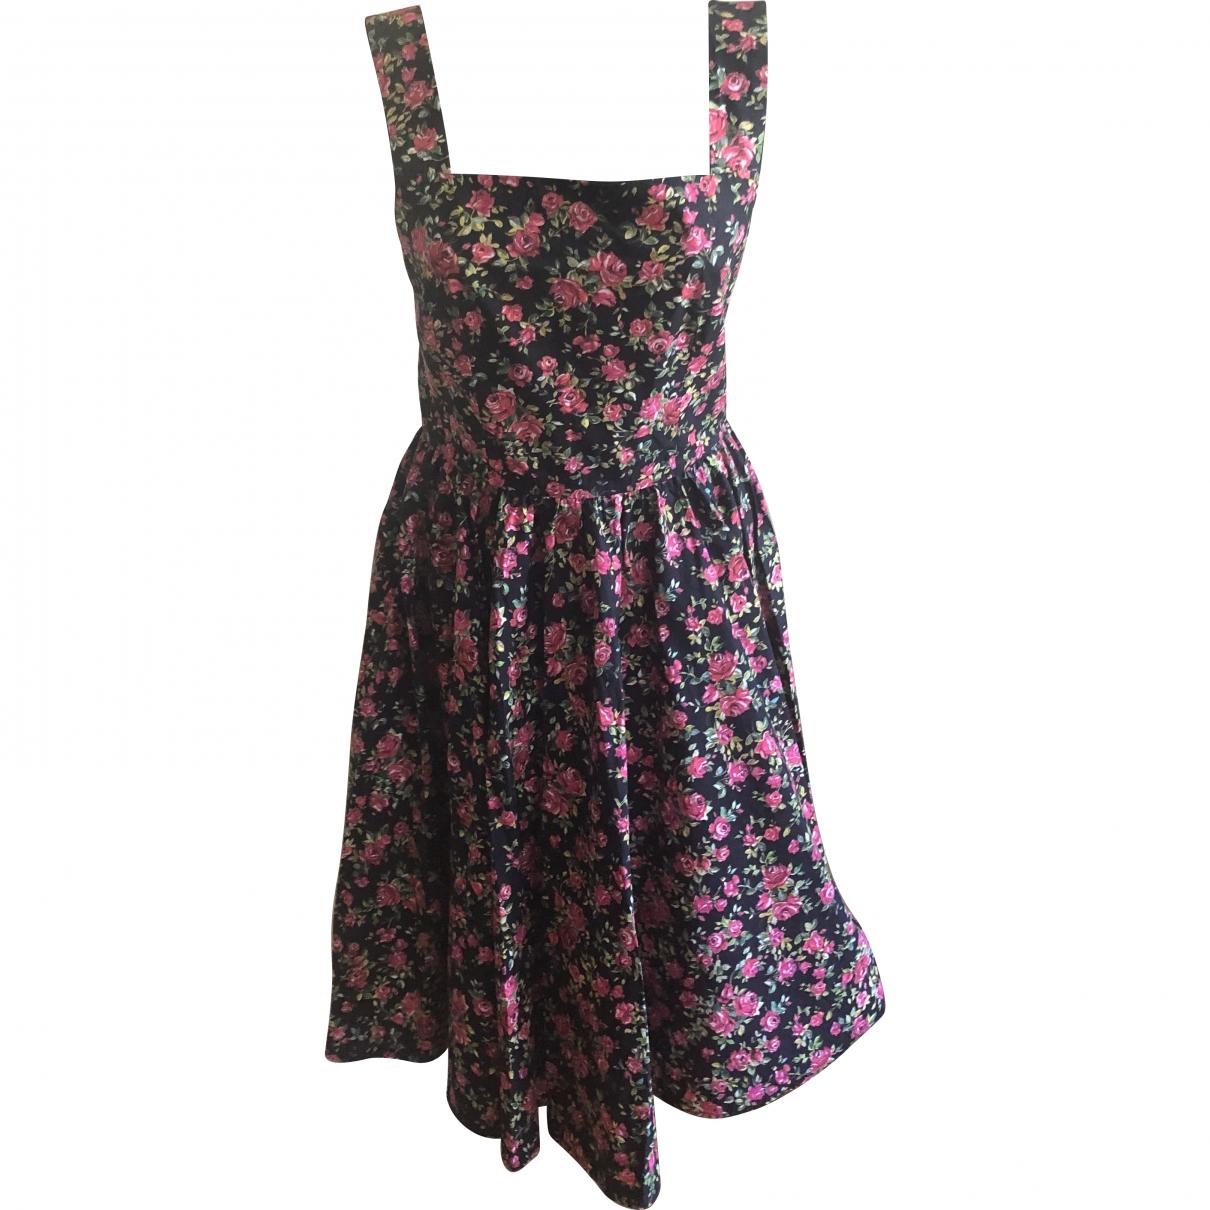 Dolce & Gabbana \N Cotton dress for Women 44 IT